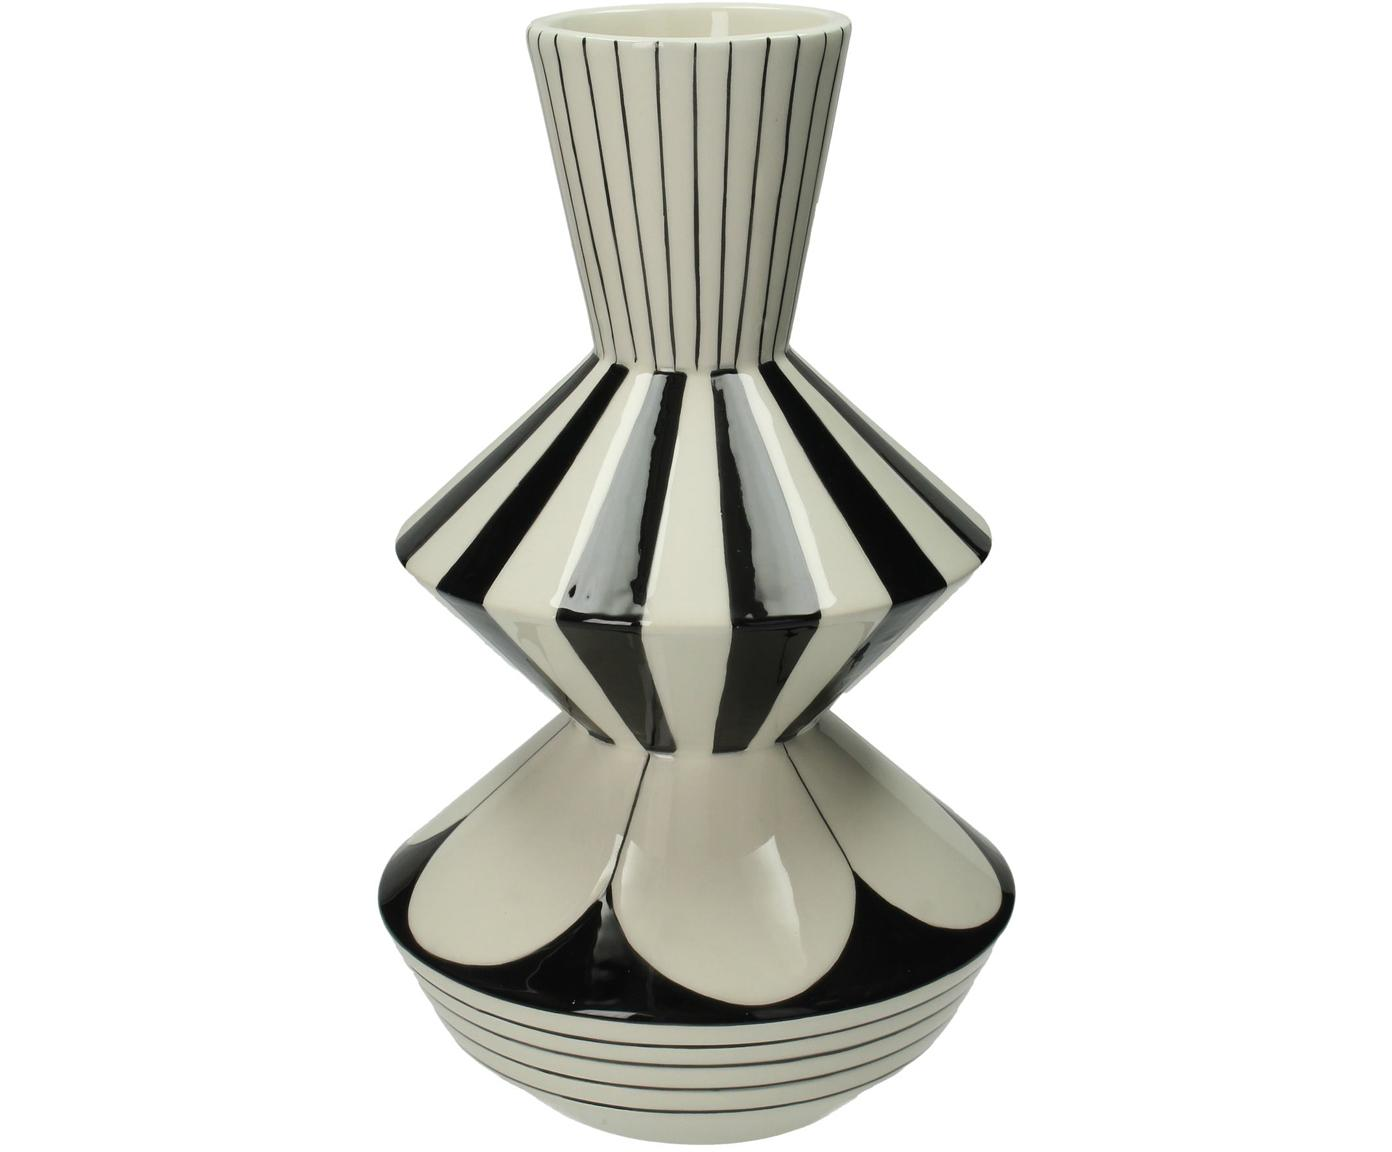 Vaso Graphic, Gres, Bianco, nero, Ø 17 x Alt. 29 cm